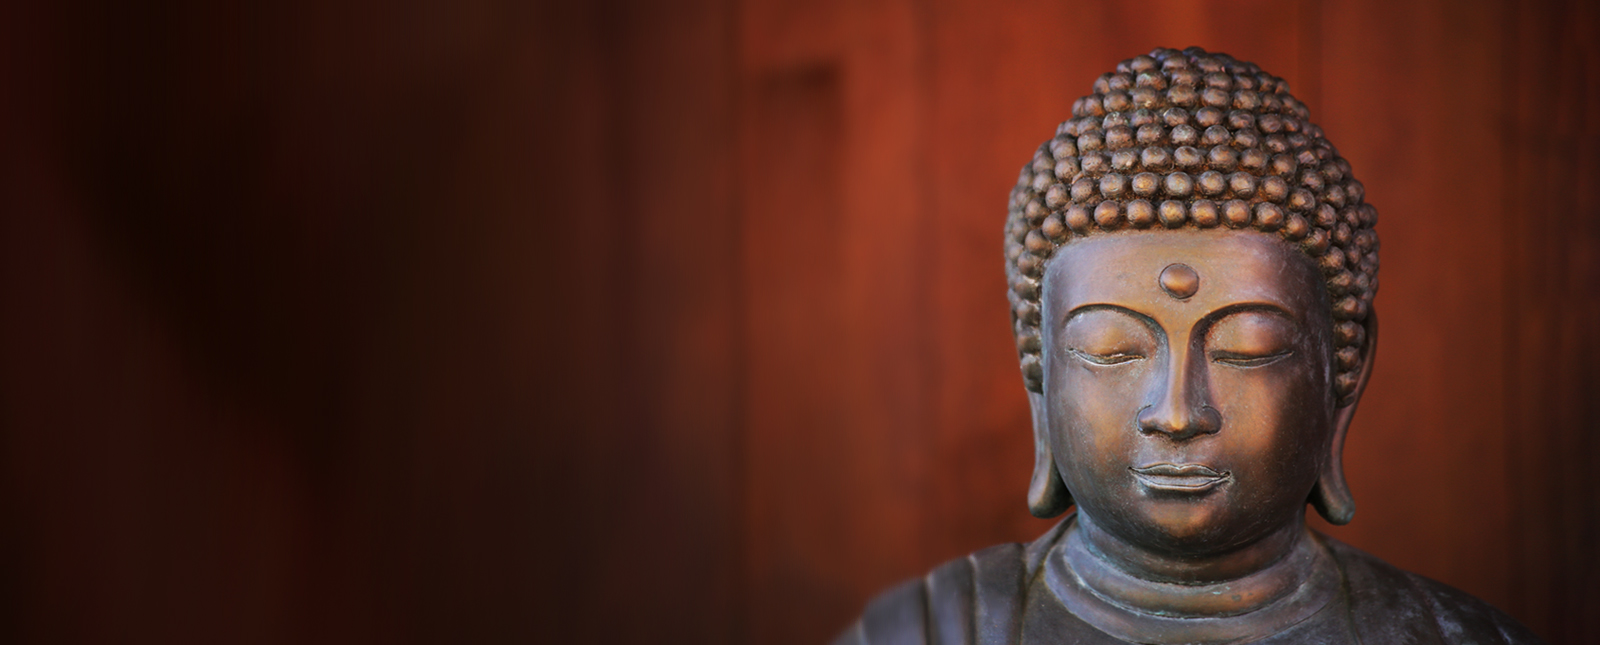 deep meditation quotes